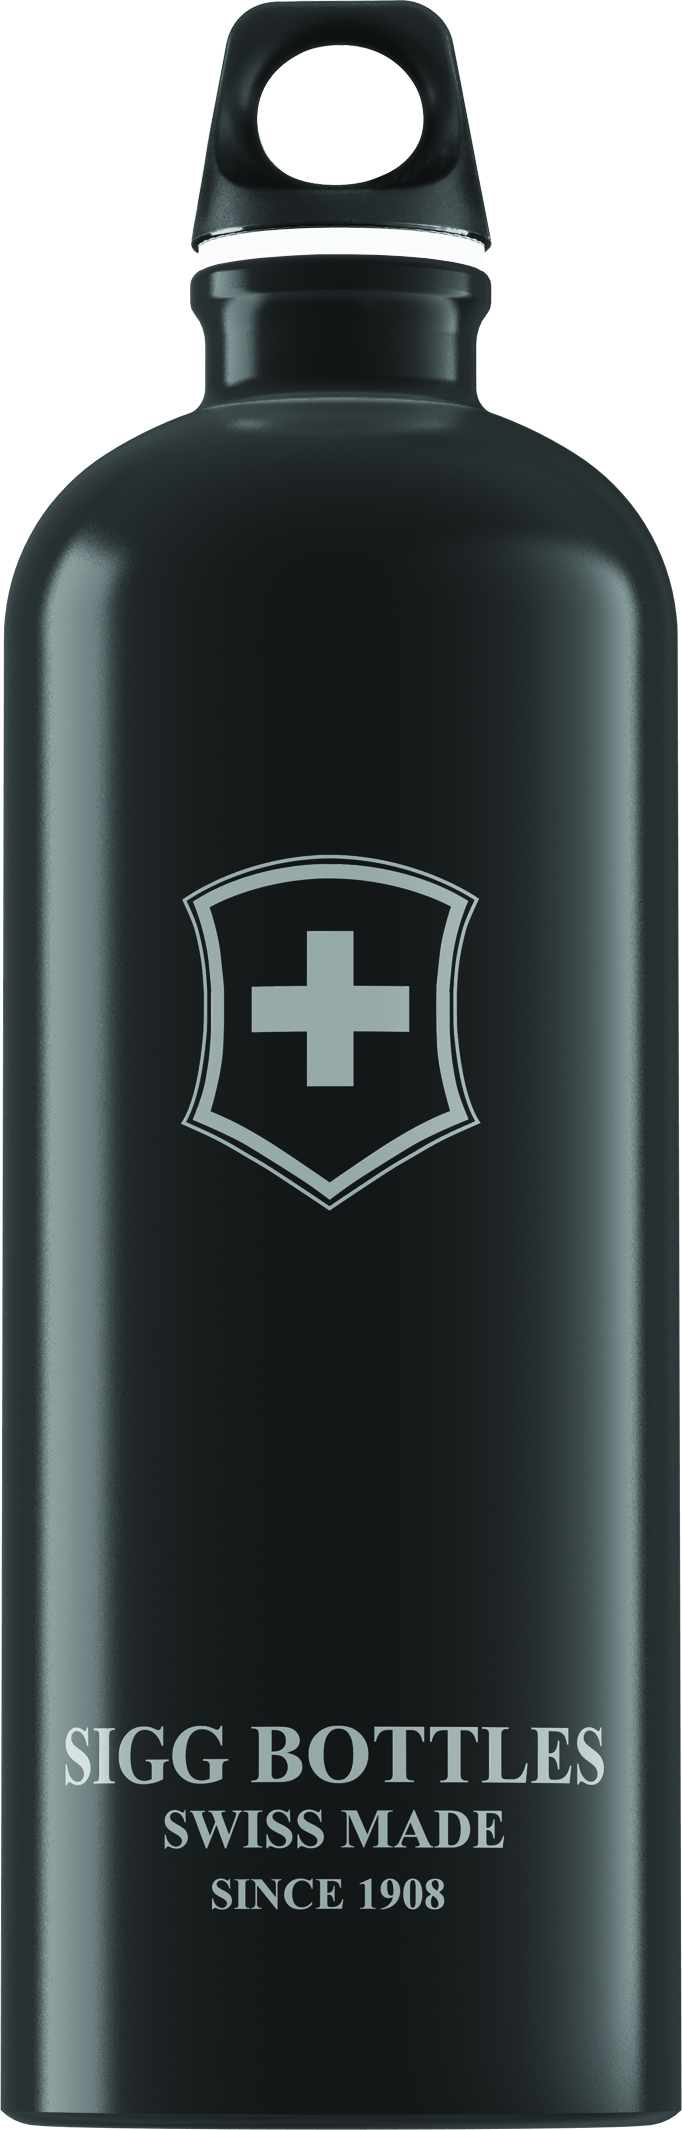 Lahev SIGG Swiss Emblem Black 1 l